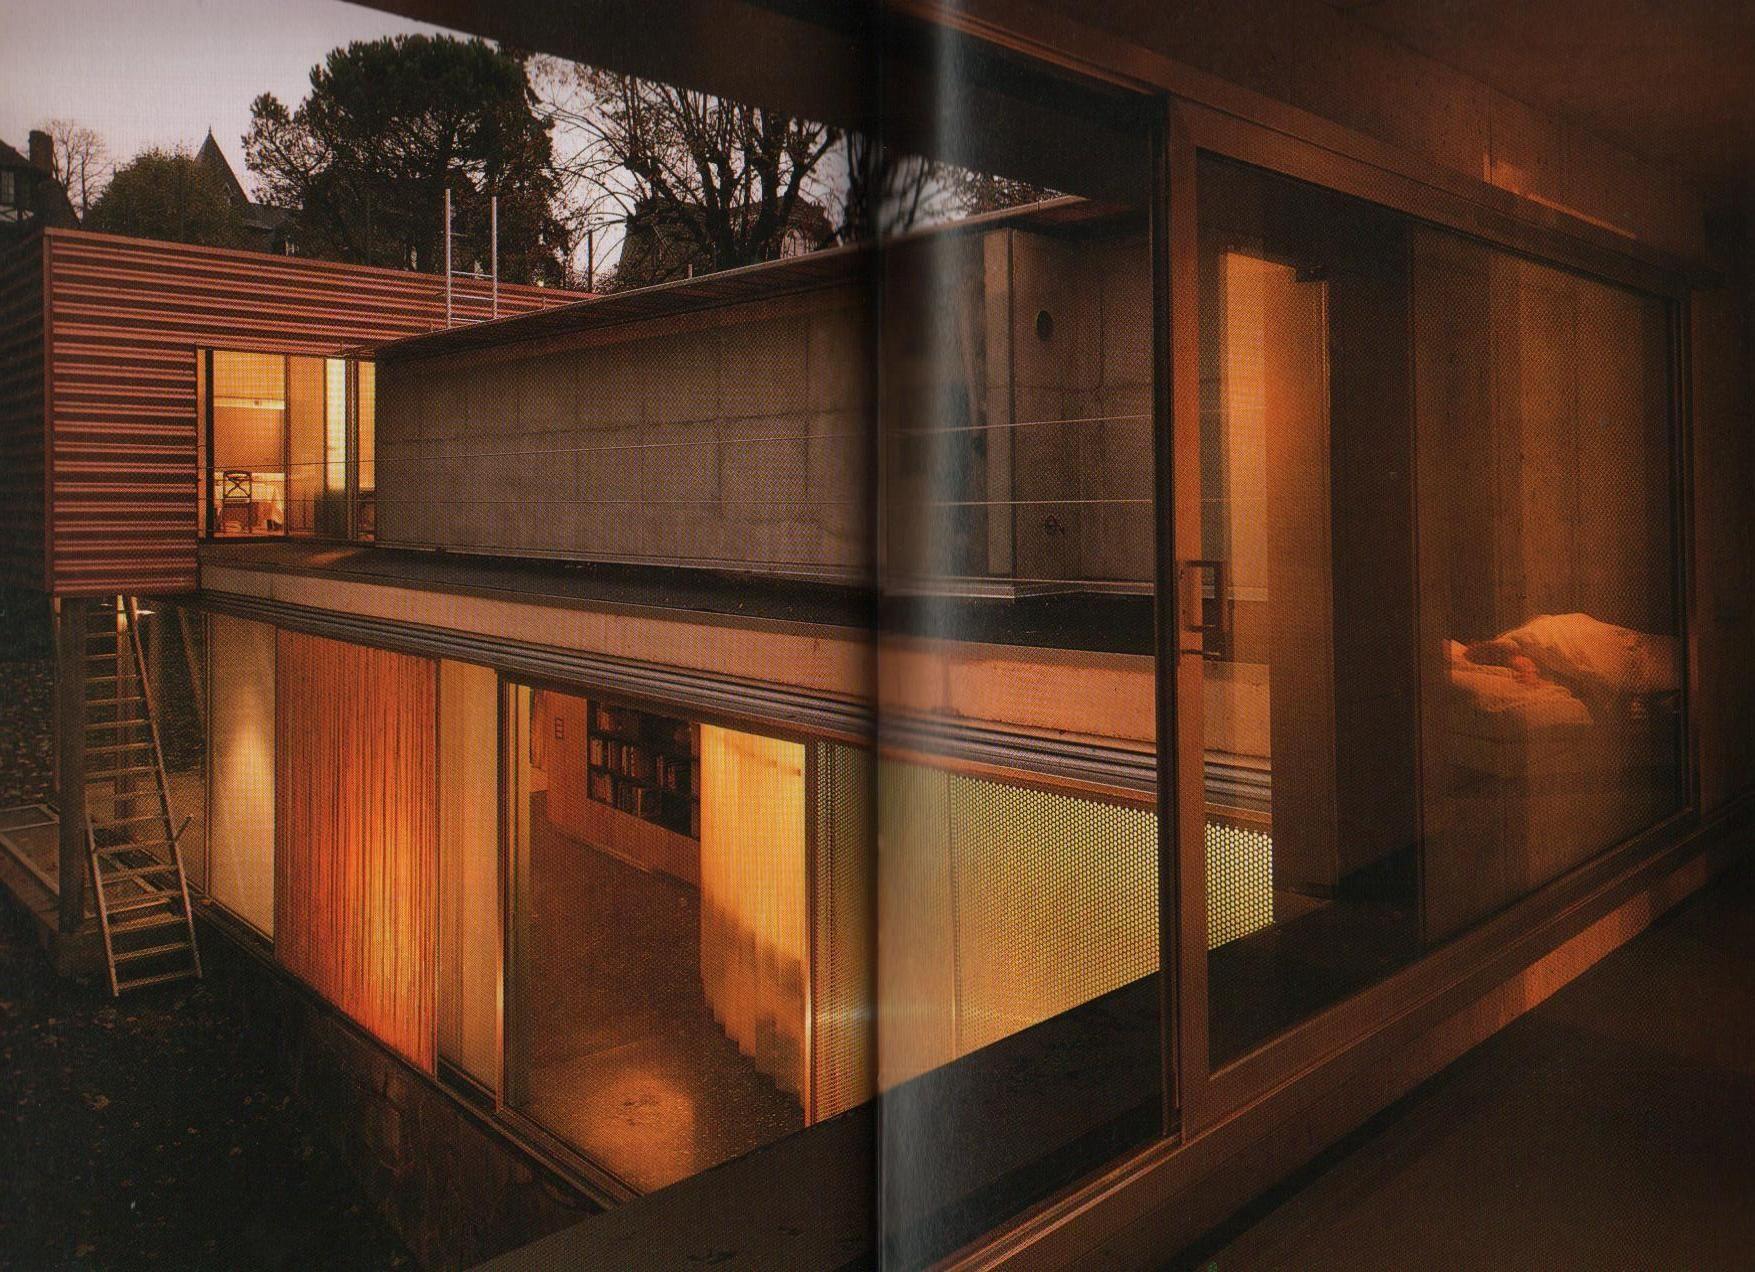 Rem koolhaas villa dall ava paris france 1991 atlas of - Koolhaas Villa Dall Ava Paris Francerem